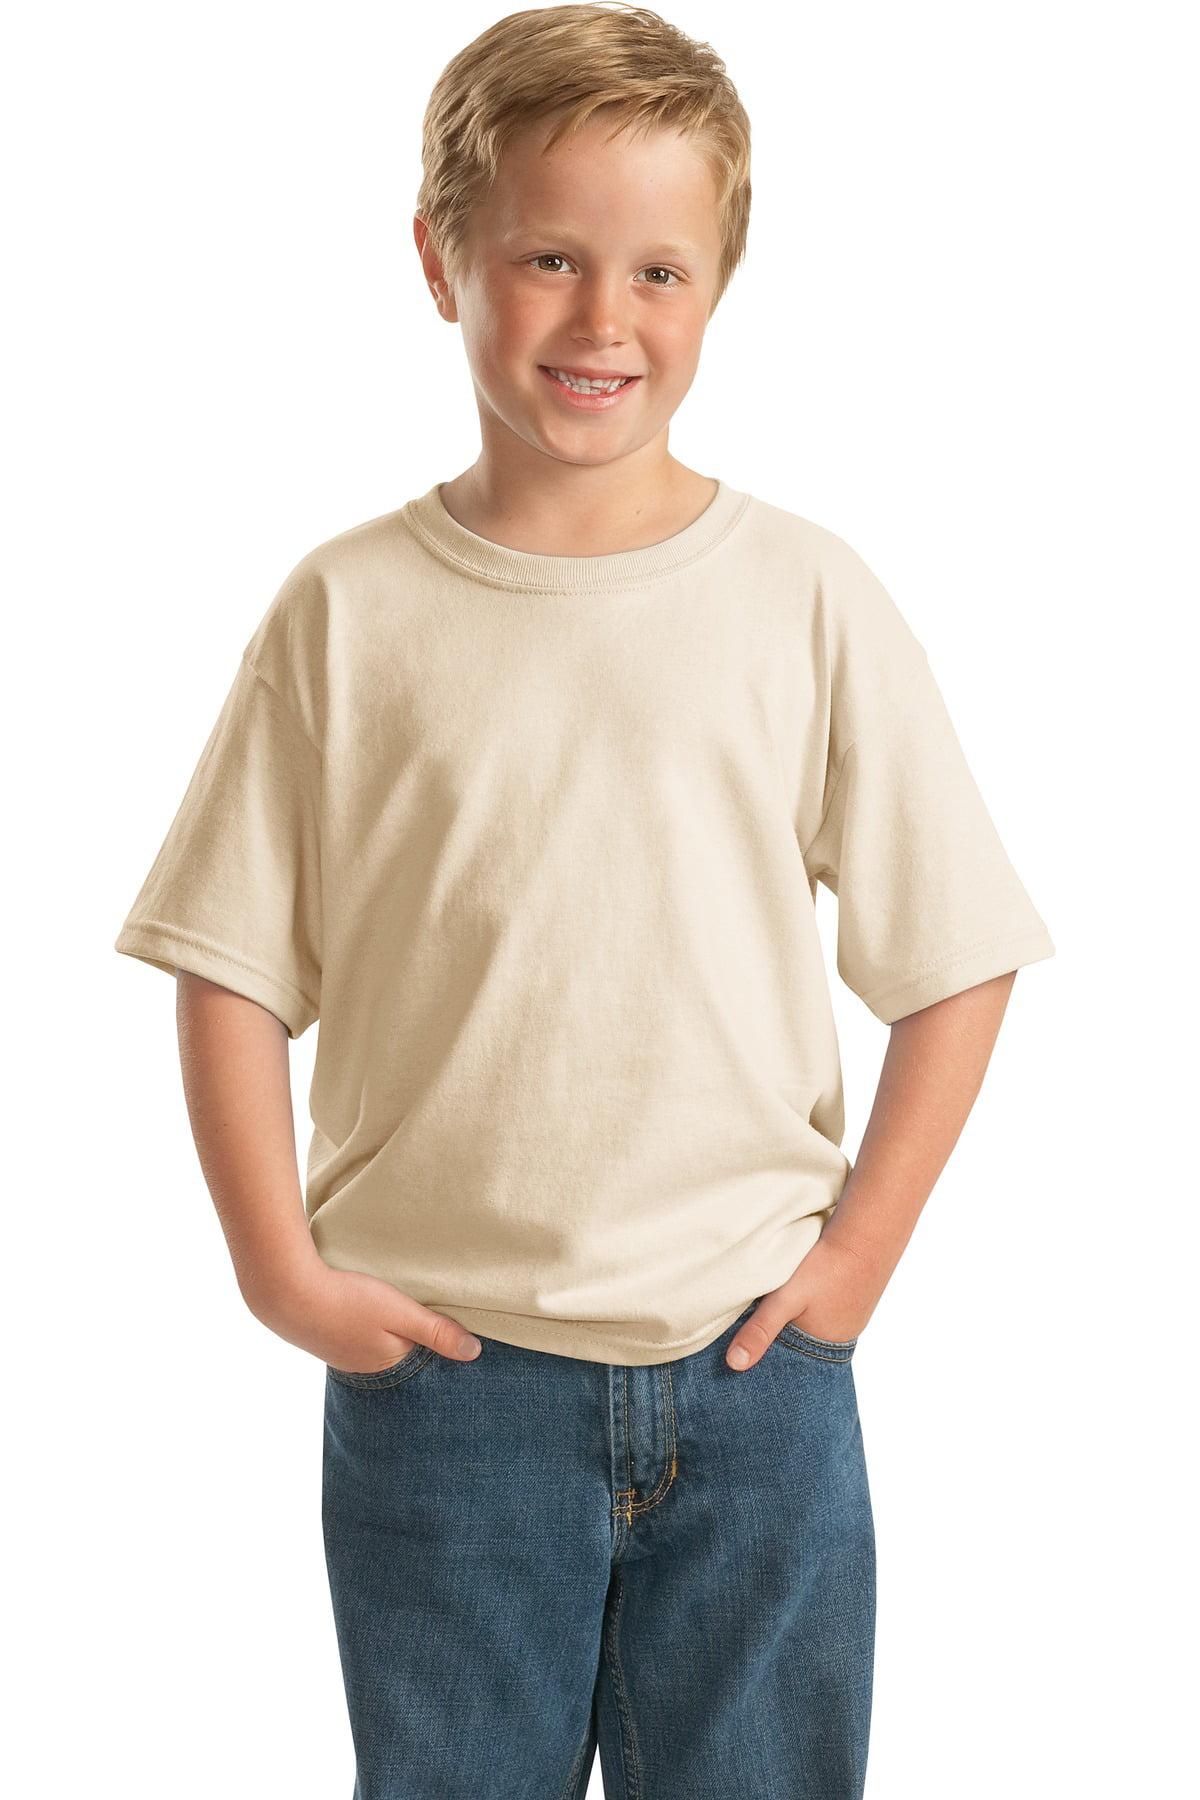 Gildan Boy's 100 Percent Cotton Short Sleeve Taped Neck T-Shirt - 5000B